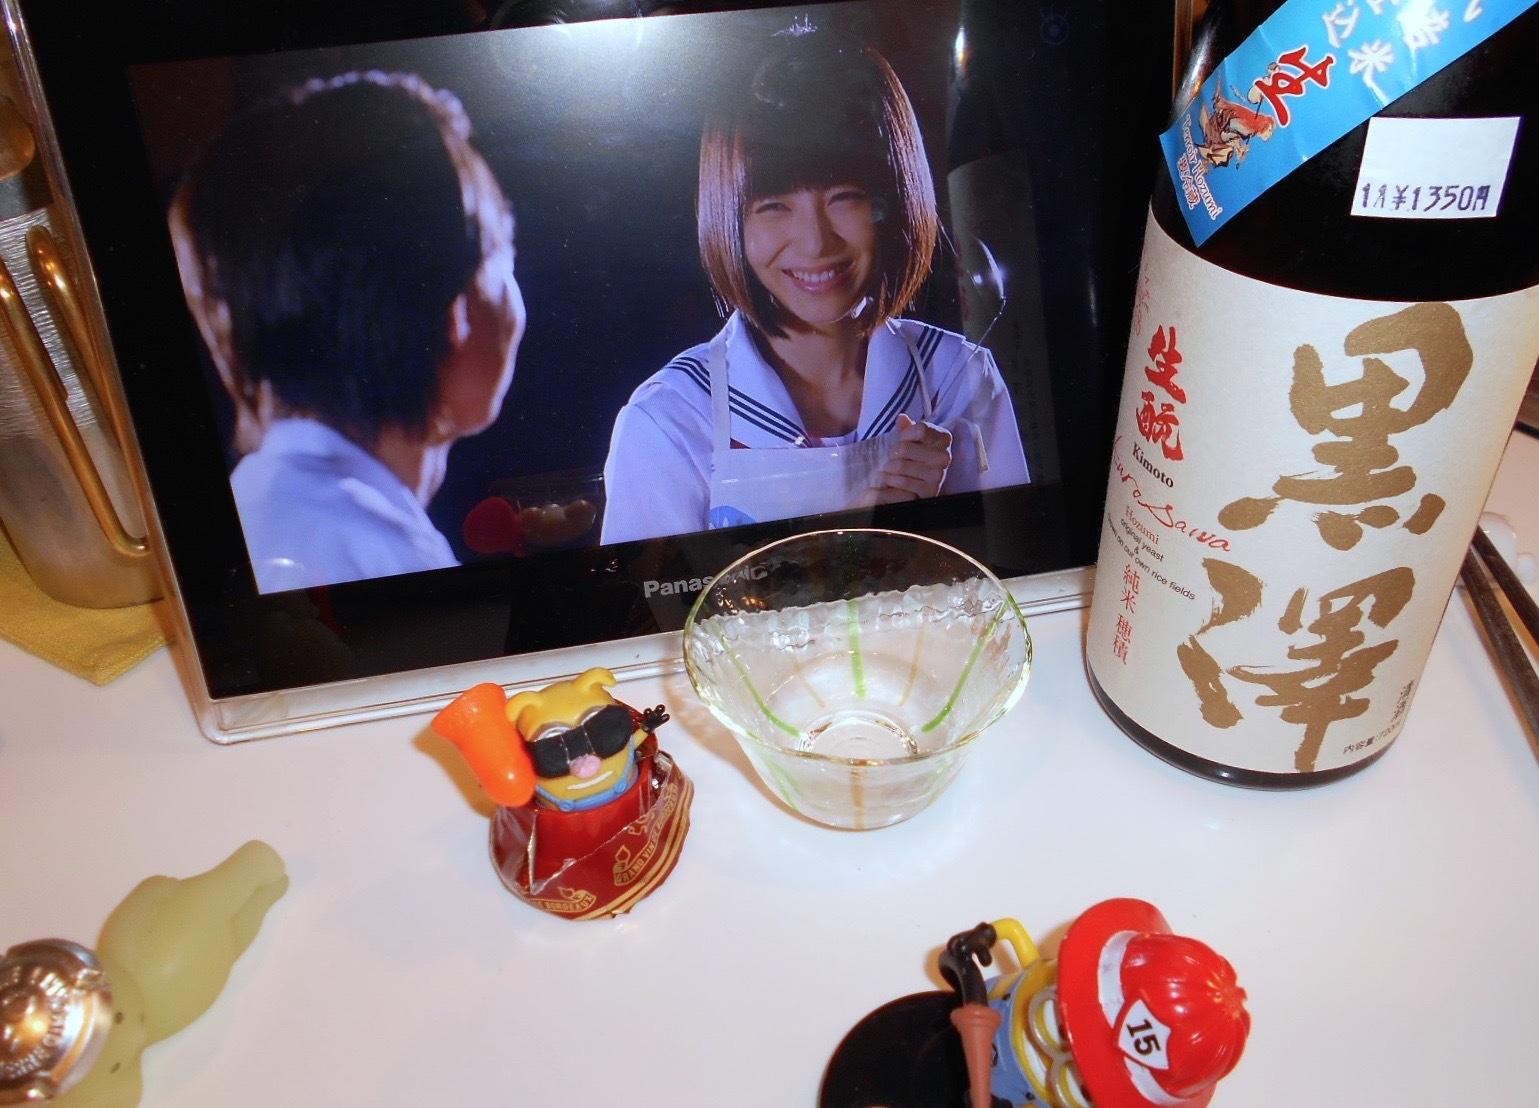 kurosawa_hozumi30by1_8.jpg